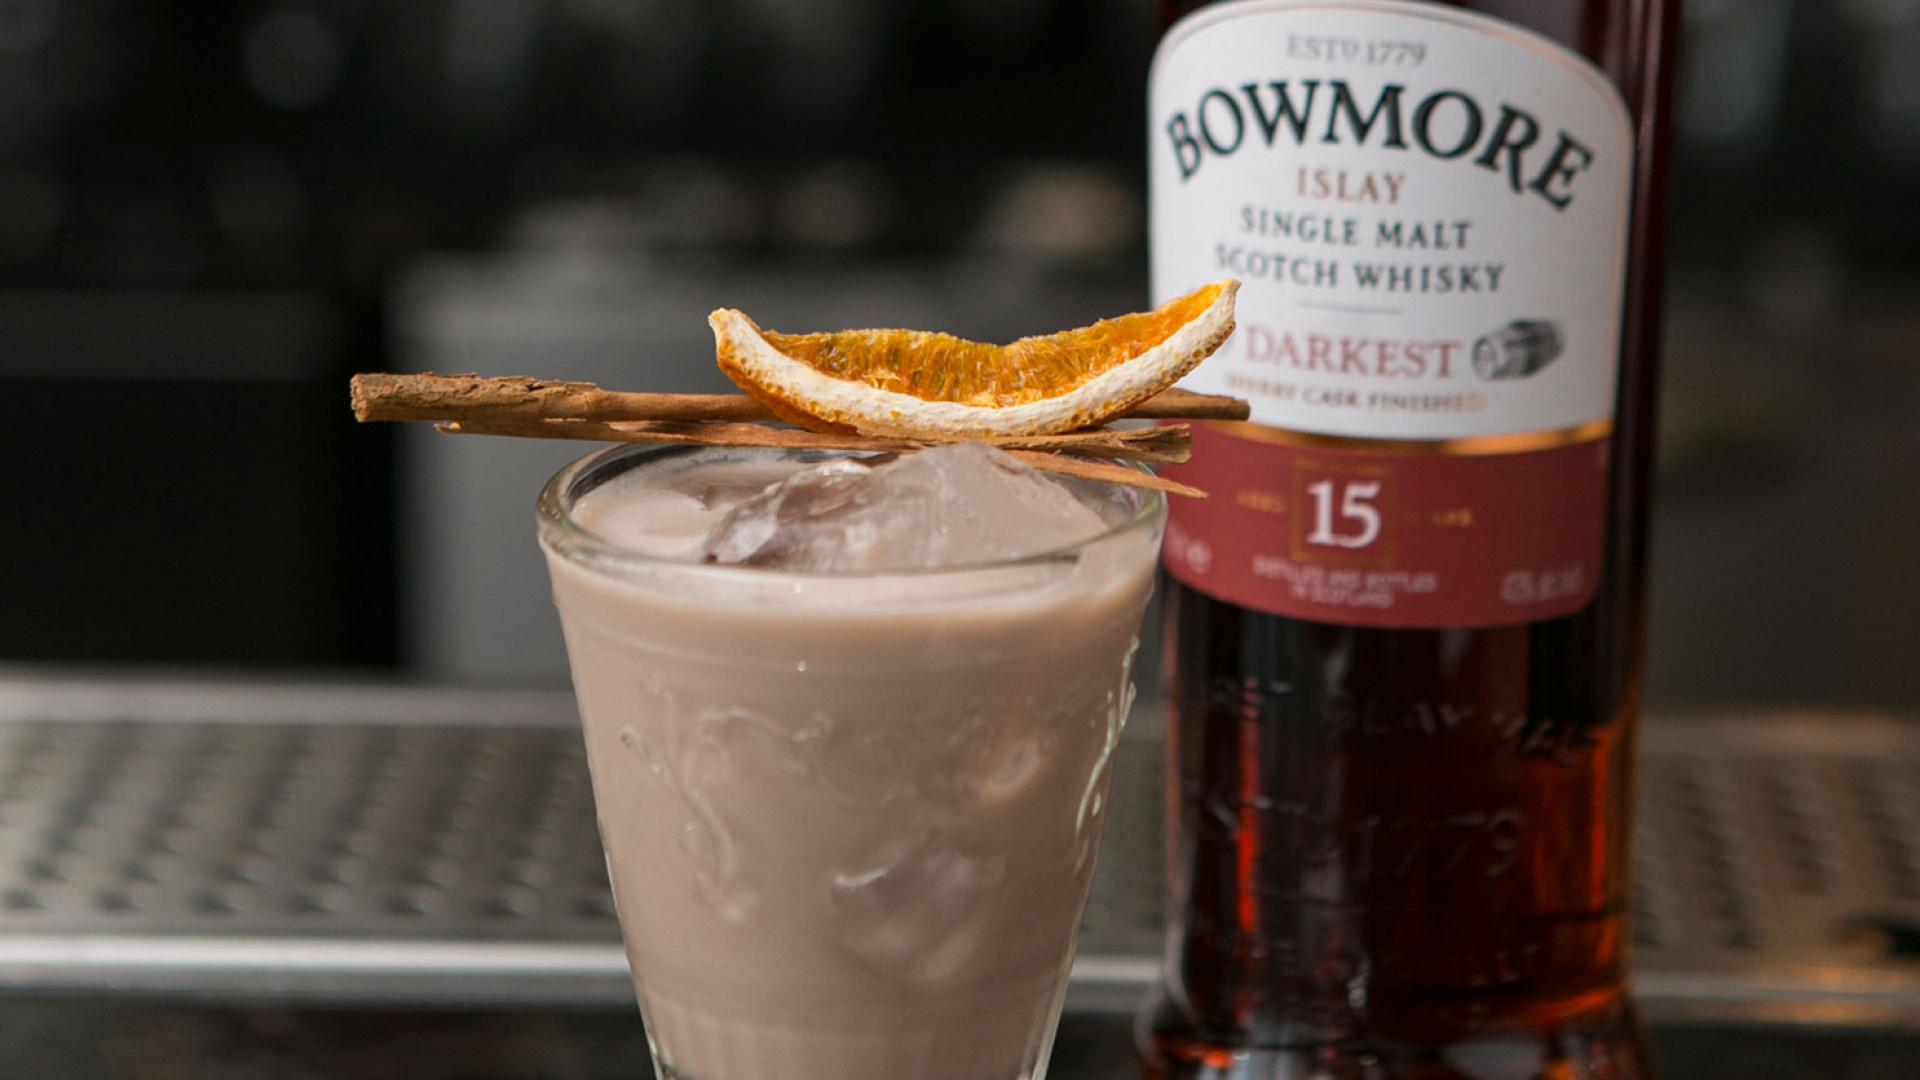 Galvin At Windows Hot Chocolate using Bowmore Darkest